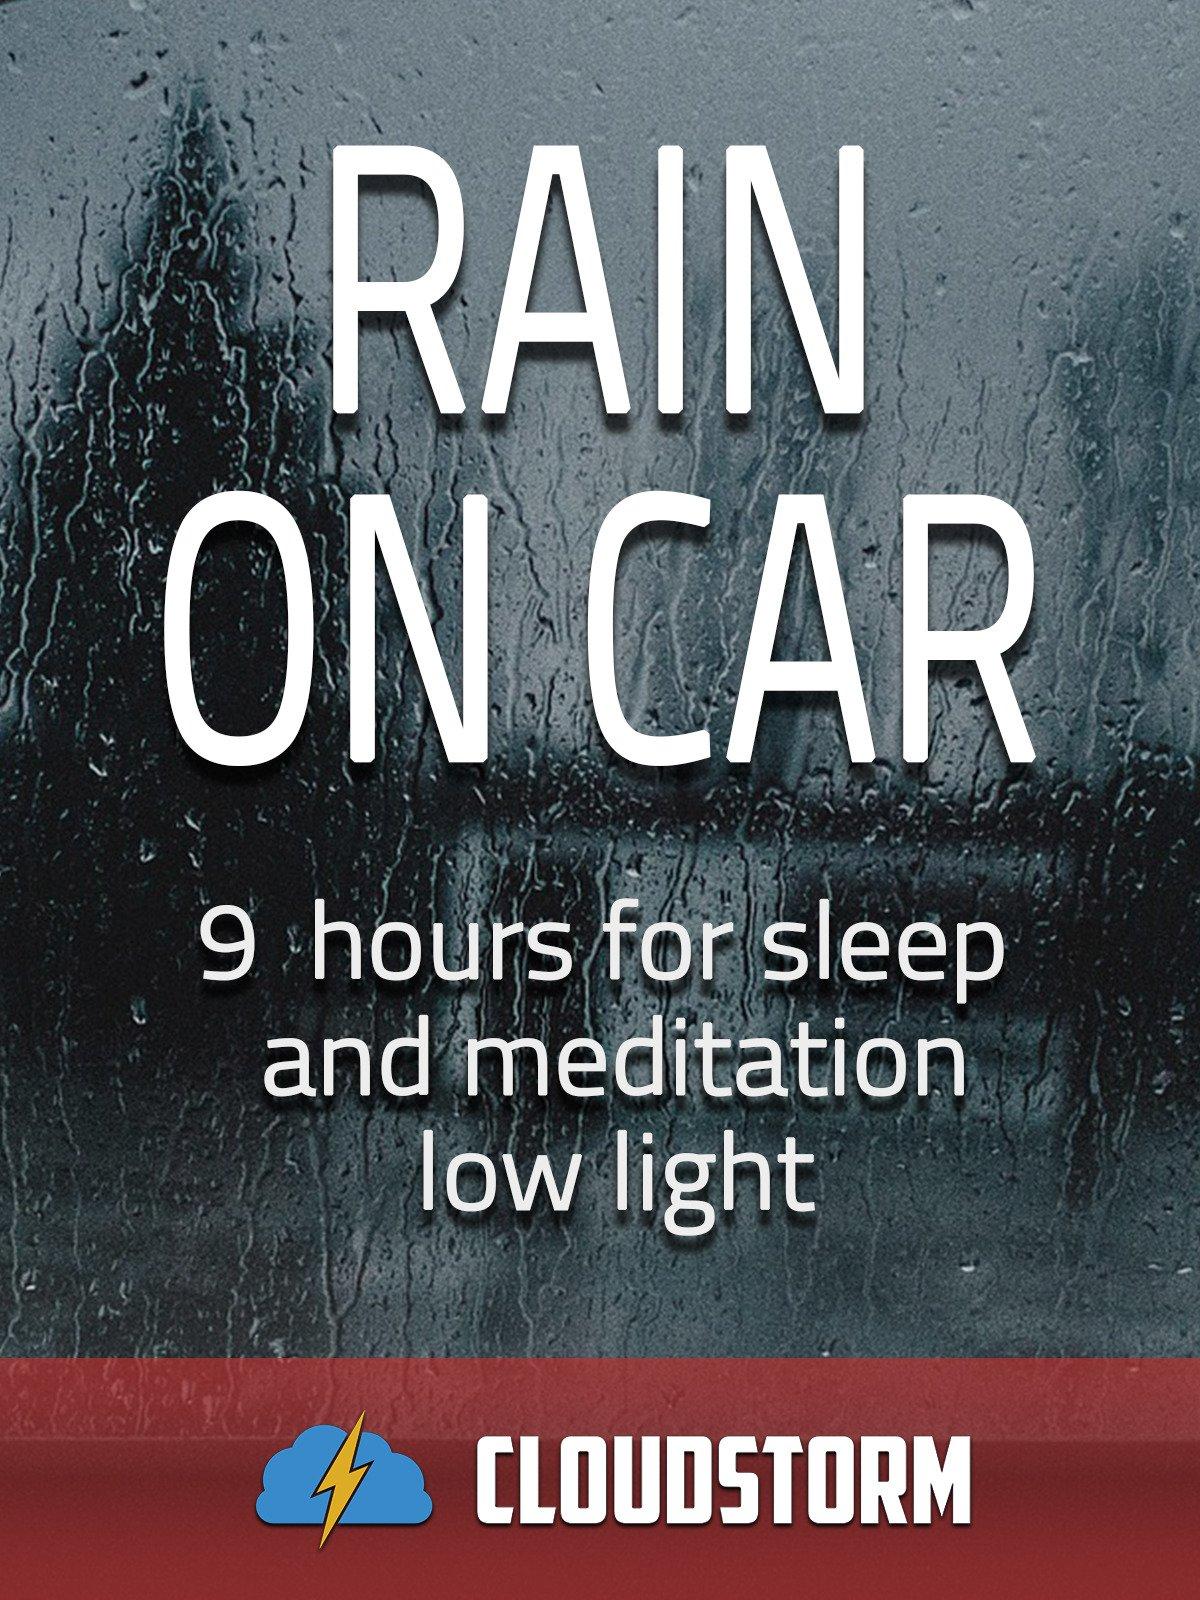 Rain on car, 9 hours for Sleep and Meditation, low light